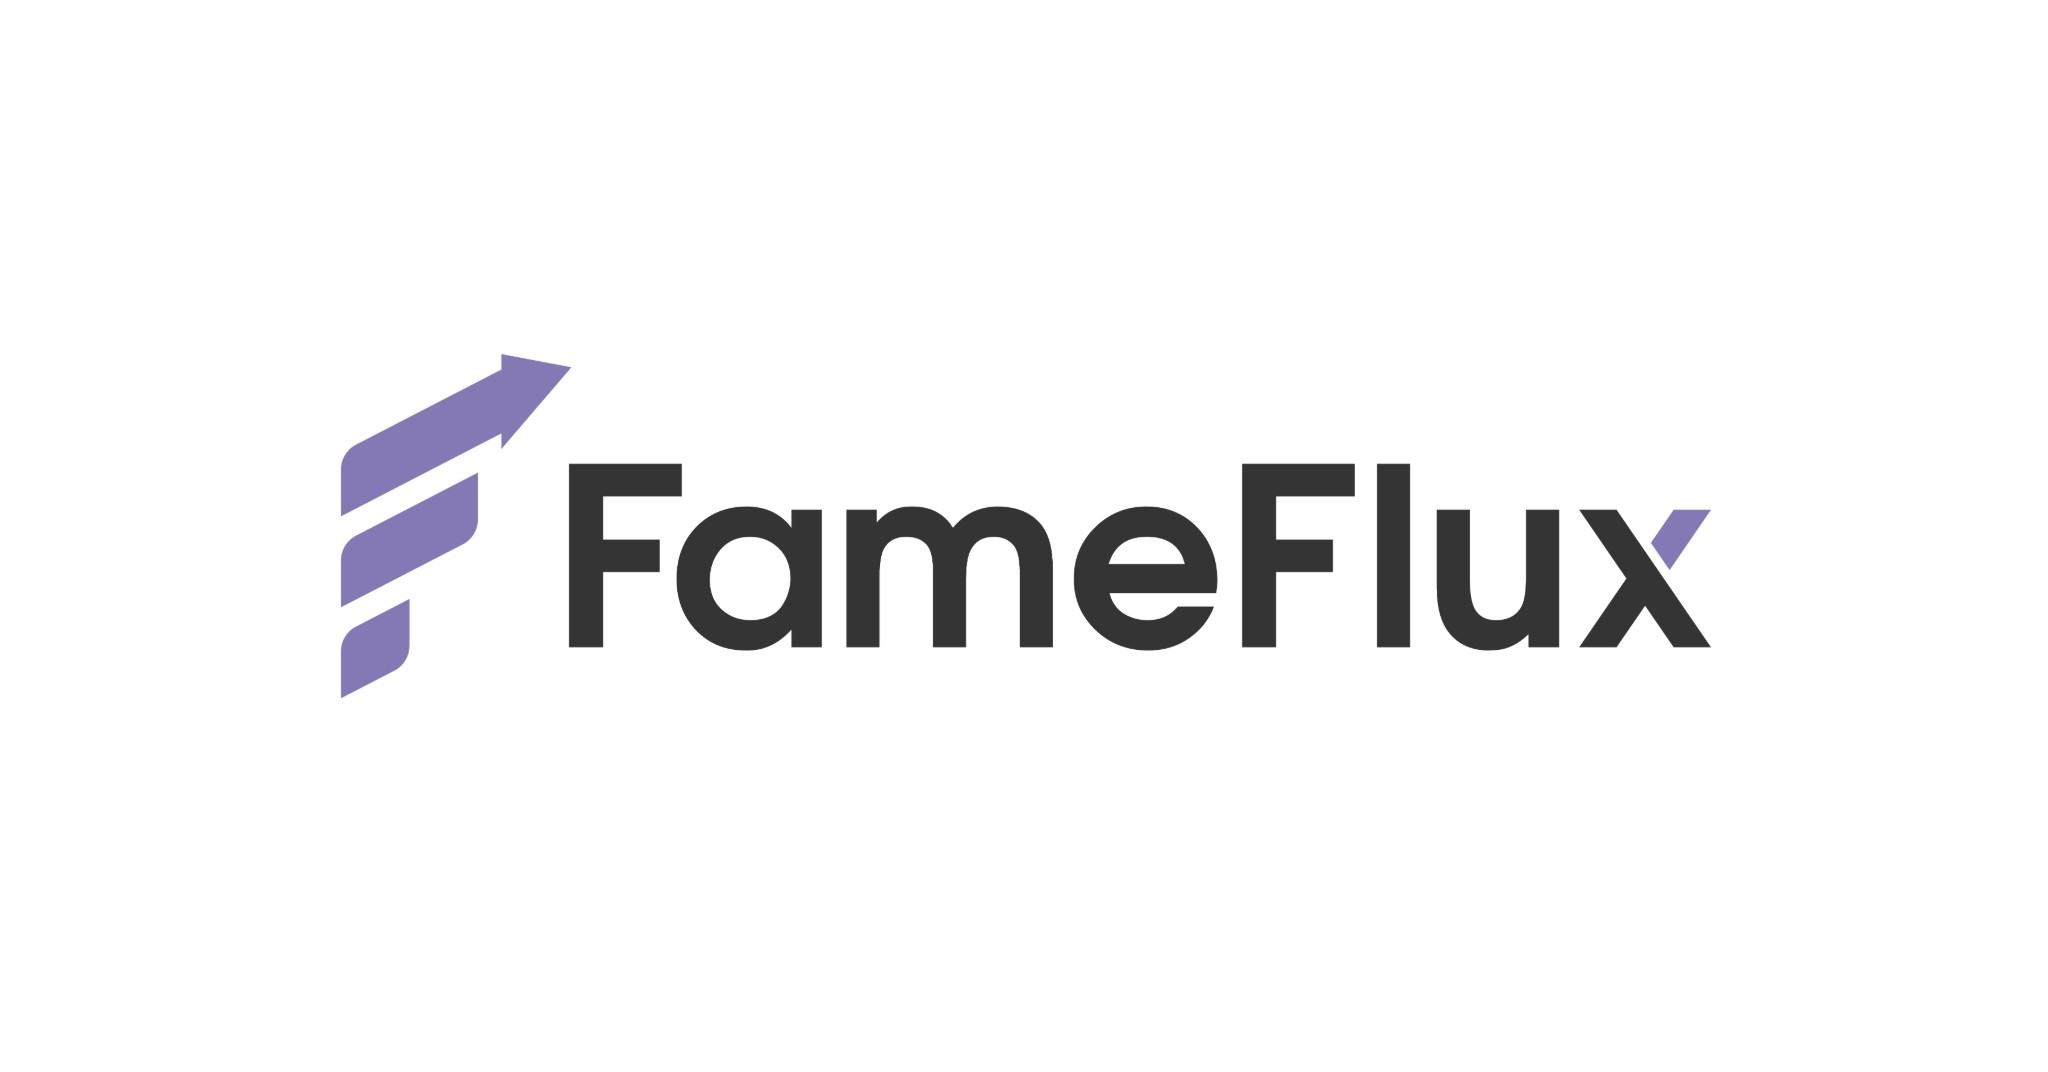 FameFlux.com